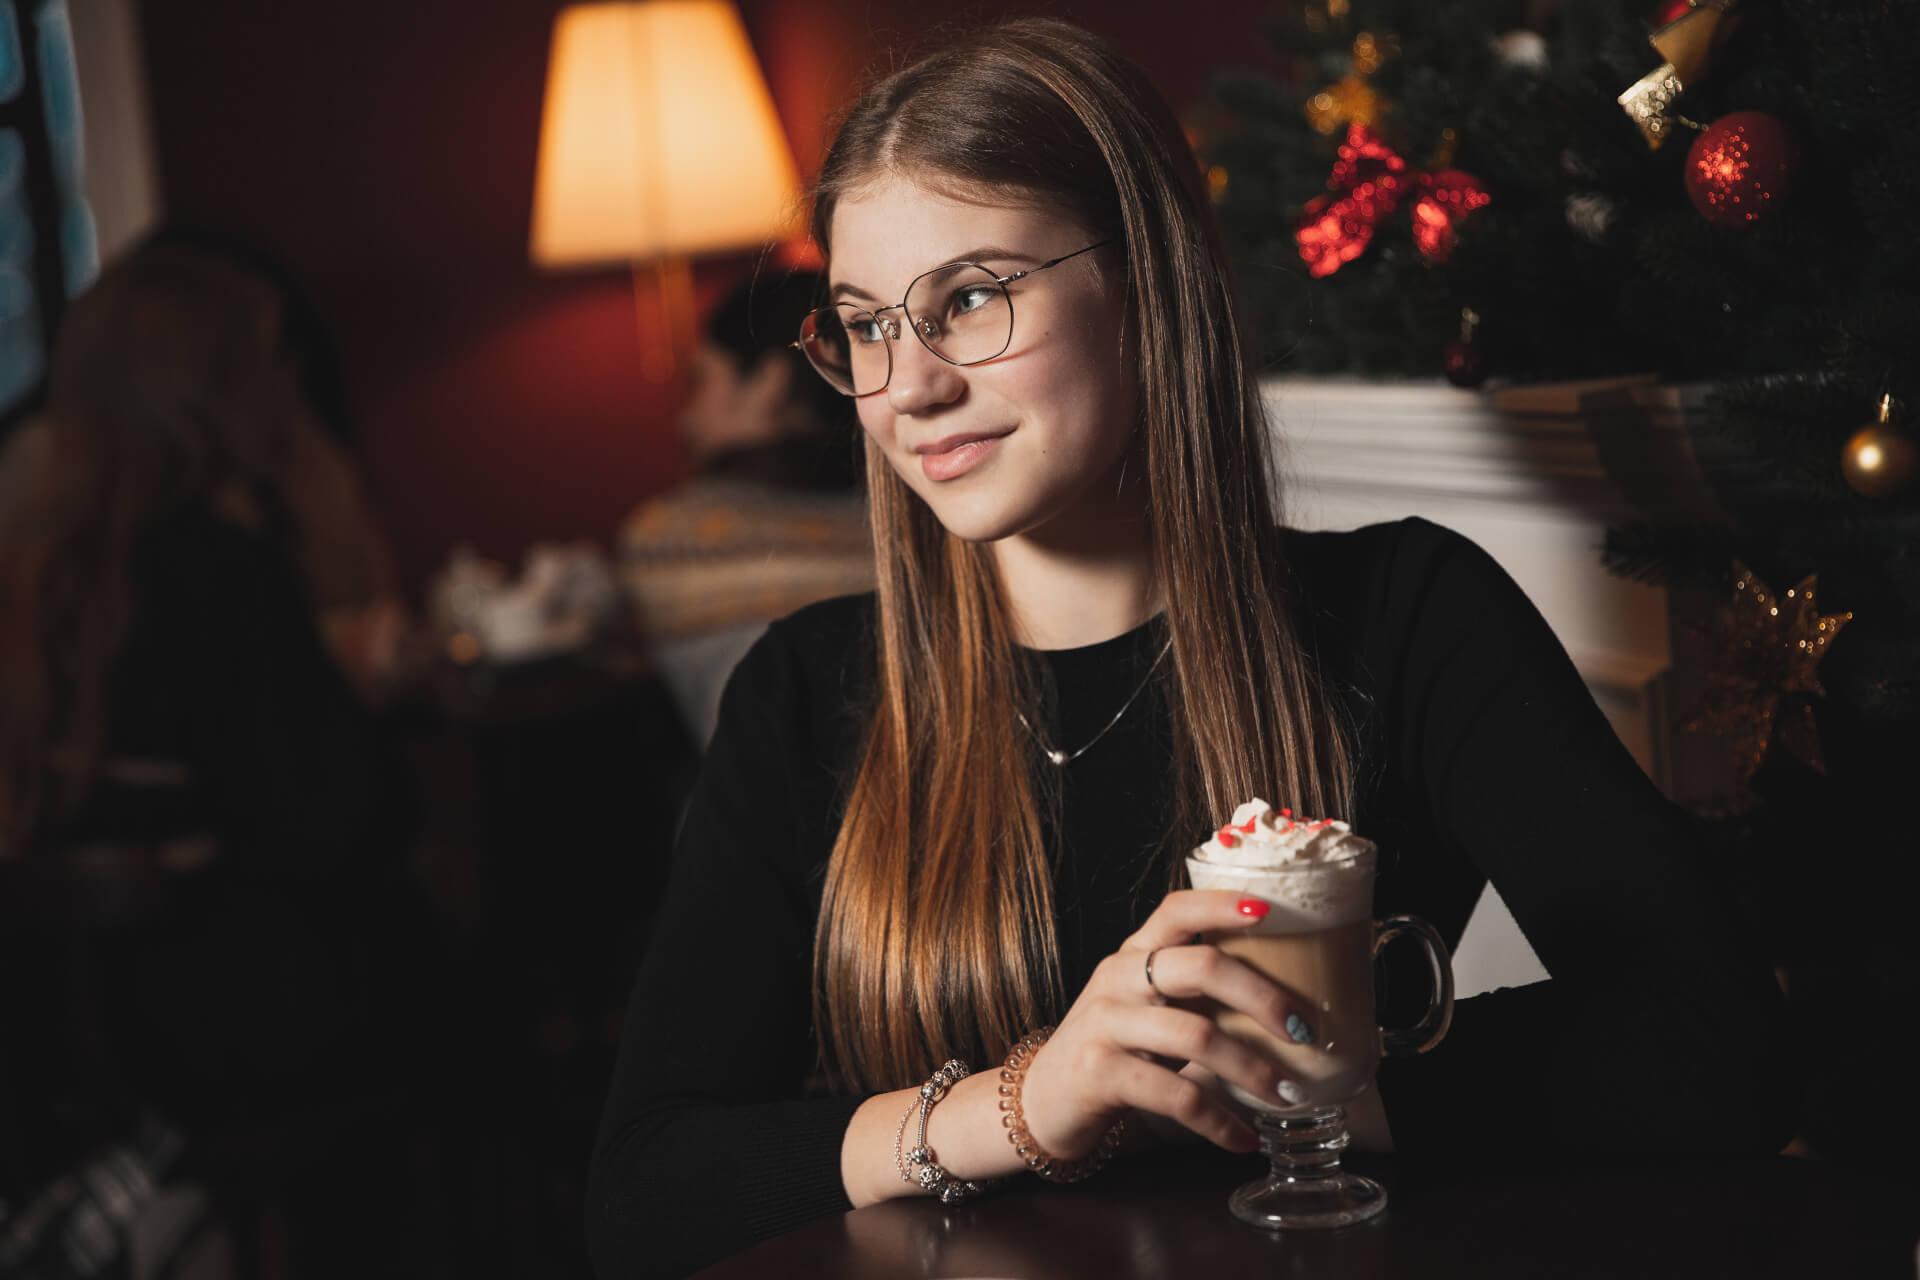 Як Каріна Смушак у 14 стала блогеркою та почала заробляти